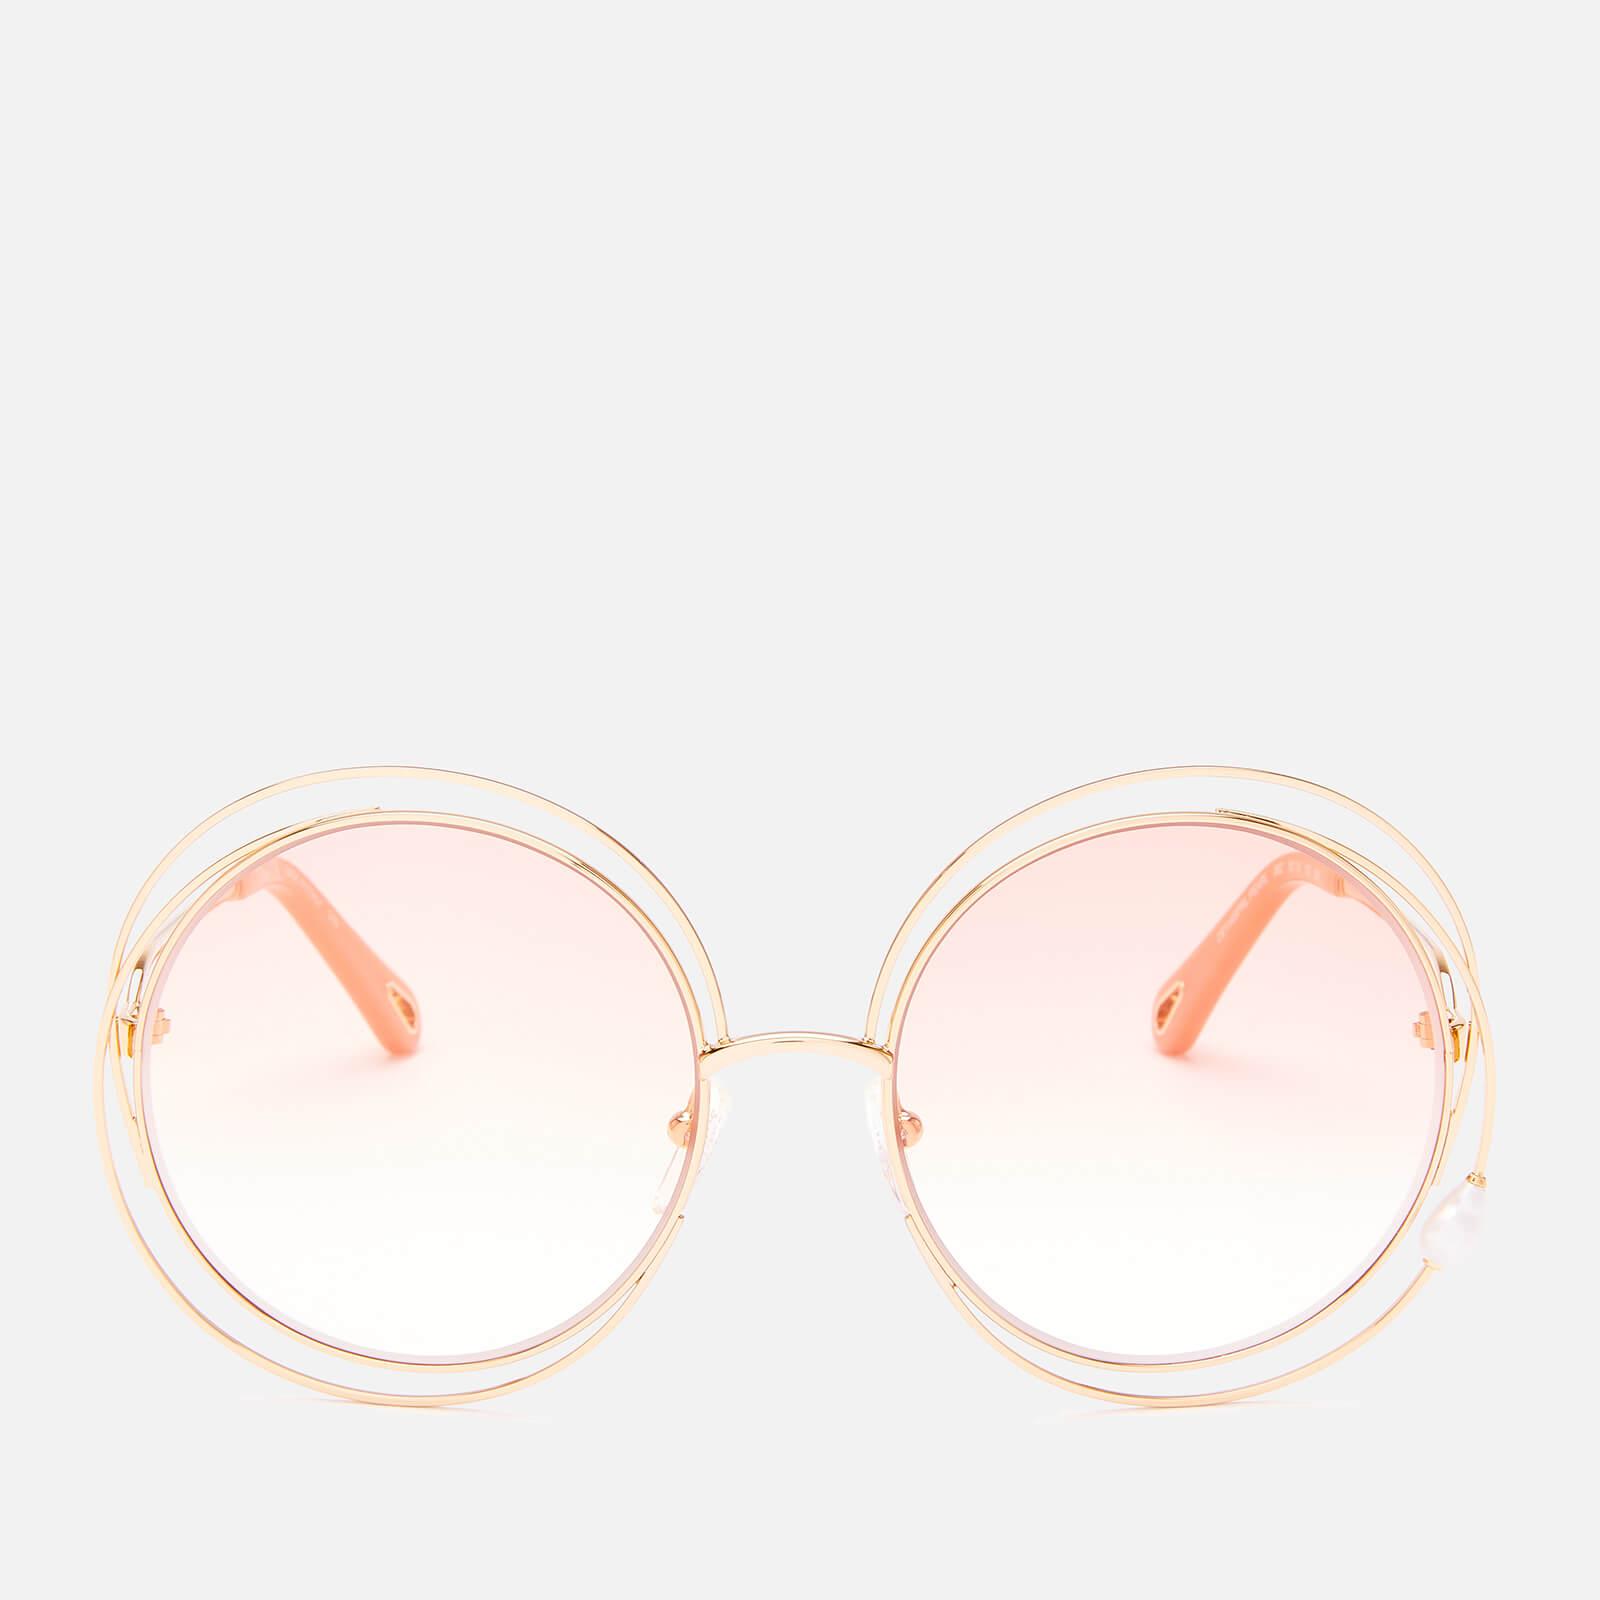 Chloé Women's Carlina Pearl Round Frame Sunglasses - Gold/Peach